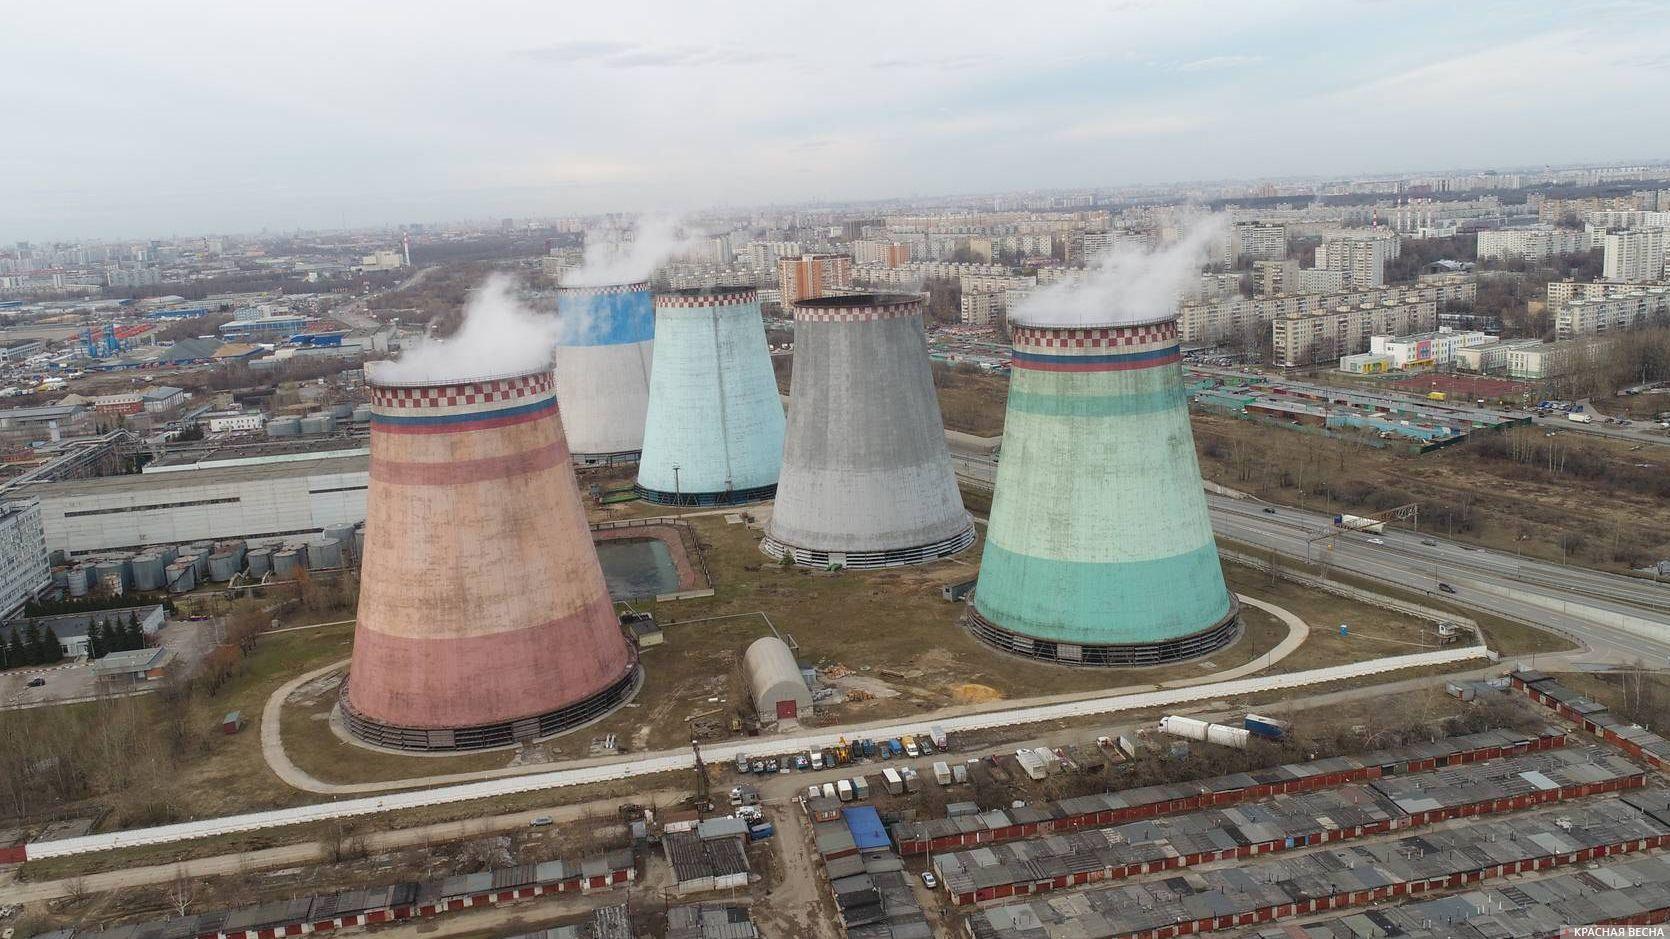 ТЭЦ. Бирюлево Западное. Москва